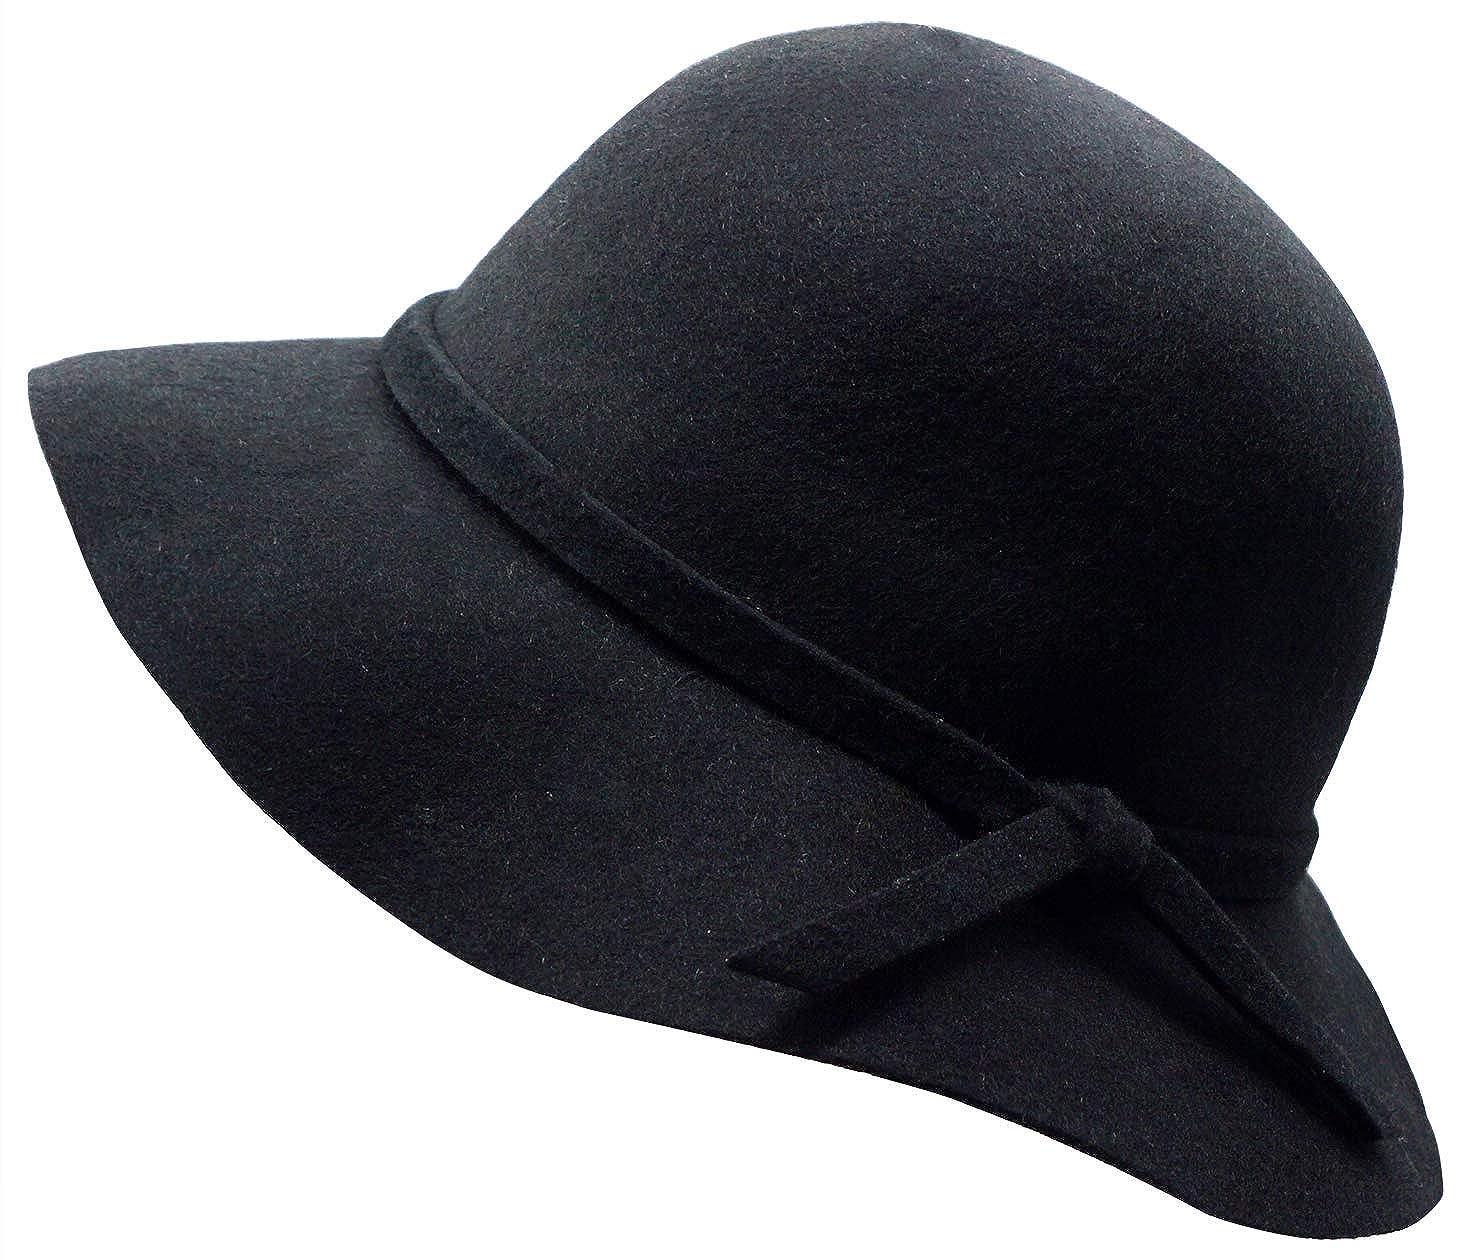 d2c842d8c6aaf4 Amazon.com: Kids Girl's Vintage Dome Wool Felt Bowler Cap Floppy Hat Bow,  Black: Clothing